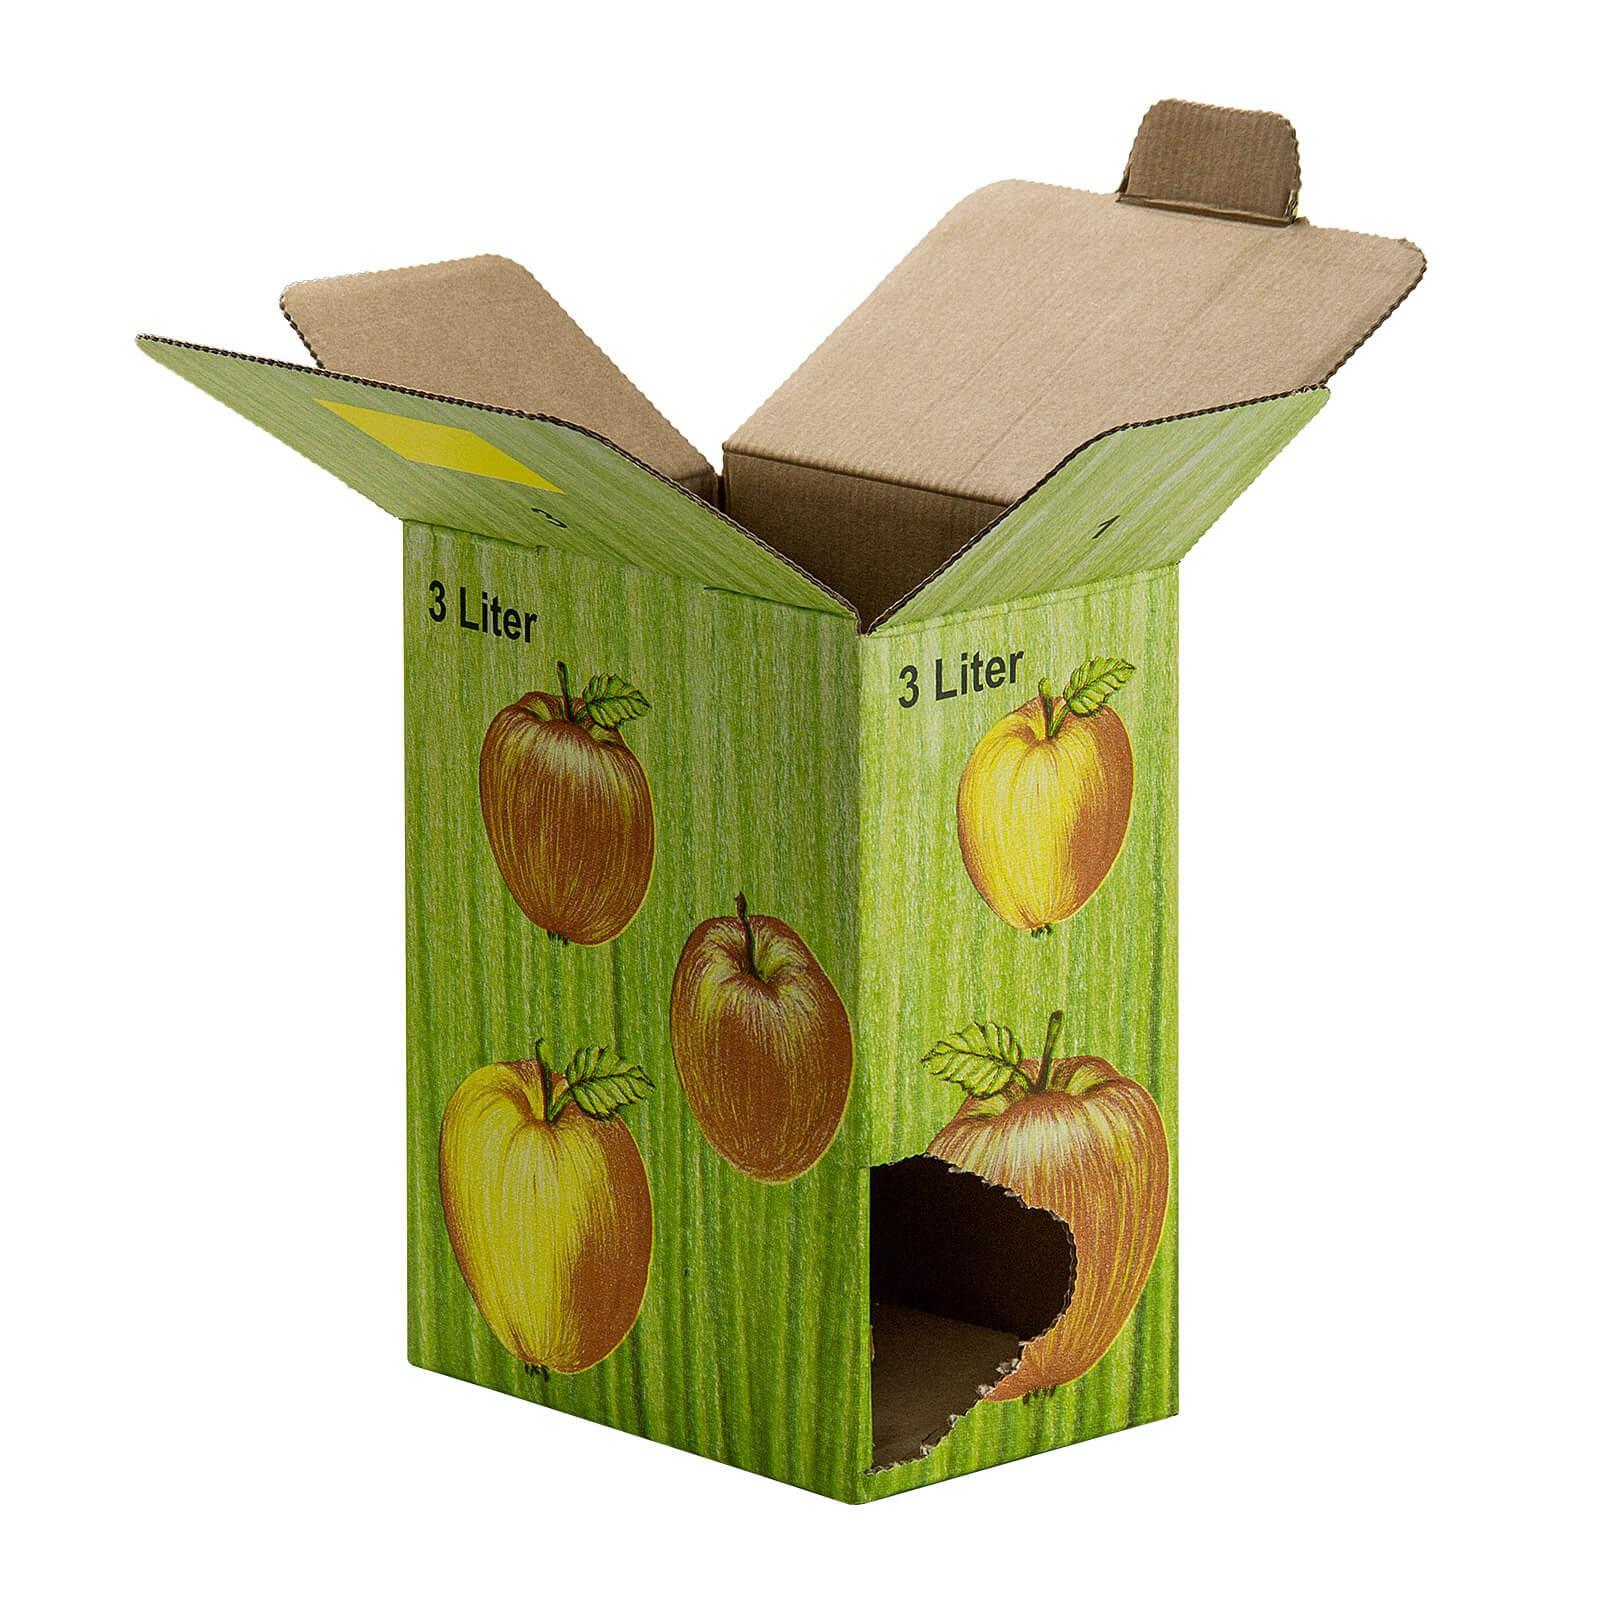 10 Stück 3 Liter Bag in Box Karton in Apfeldekor 1,30€//1Stk